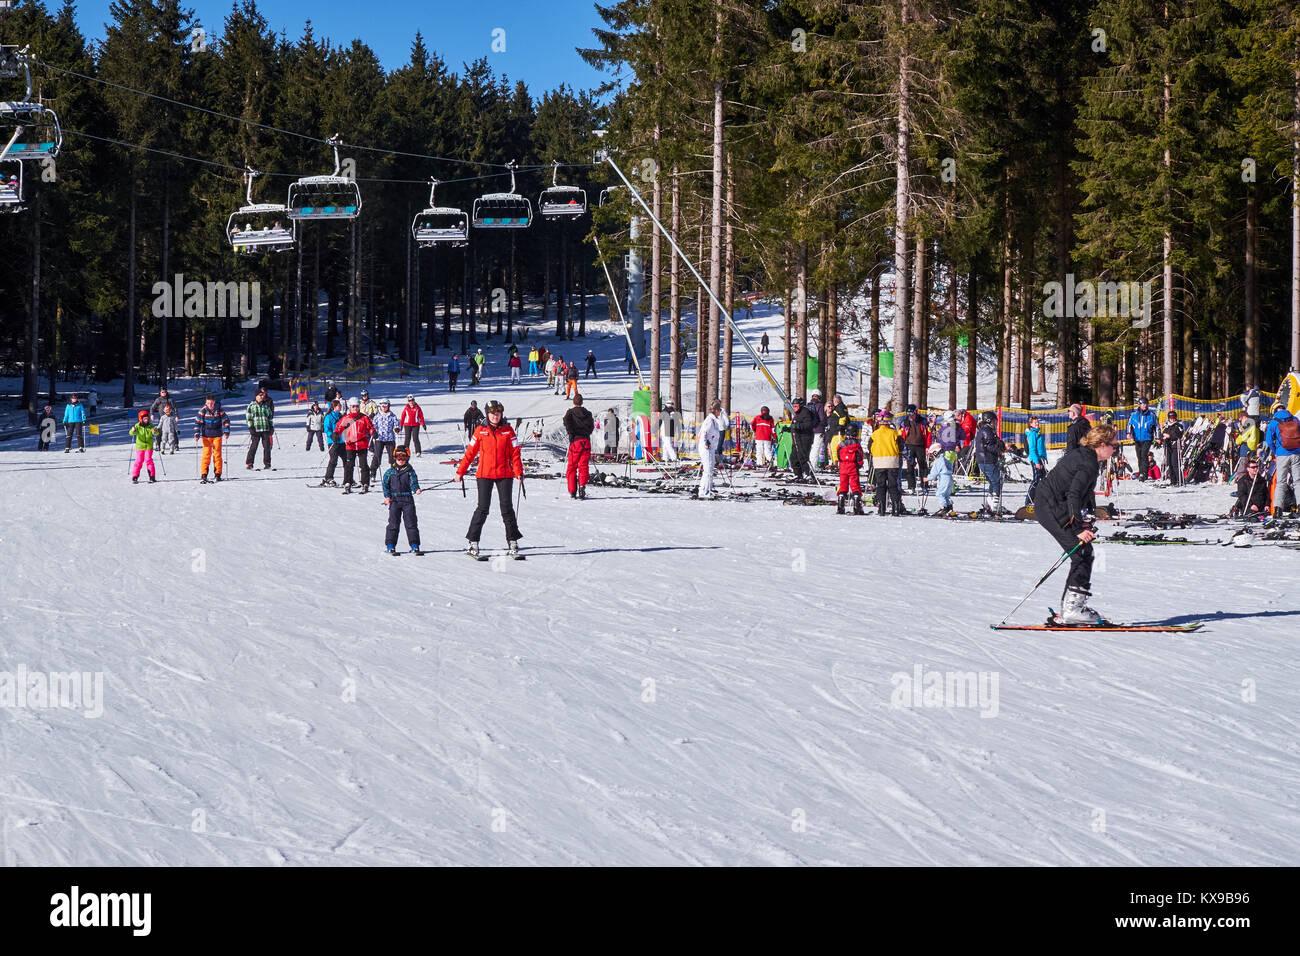 WINTERBERG, GERMANY - FEBRUARY 15, 2017: Many skiers taking a break on a piste at Ski Carousel Winterberg - Stock Image